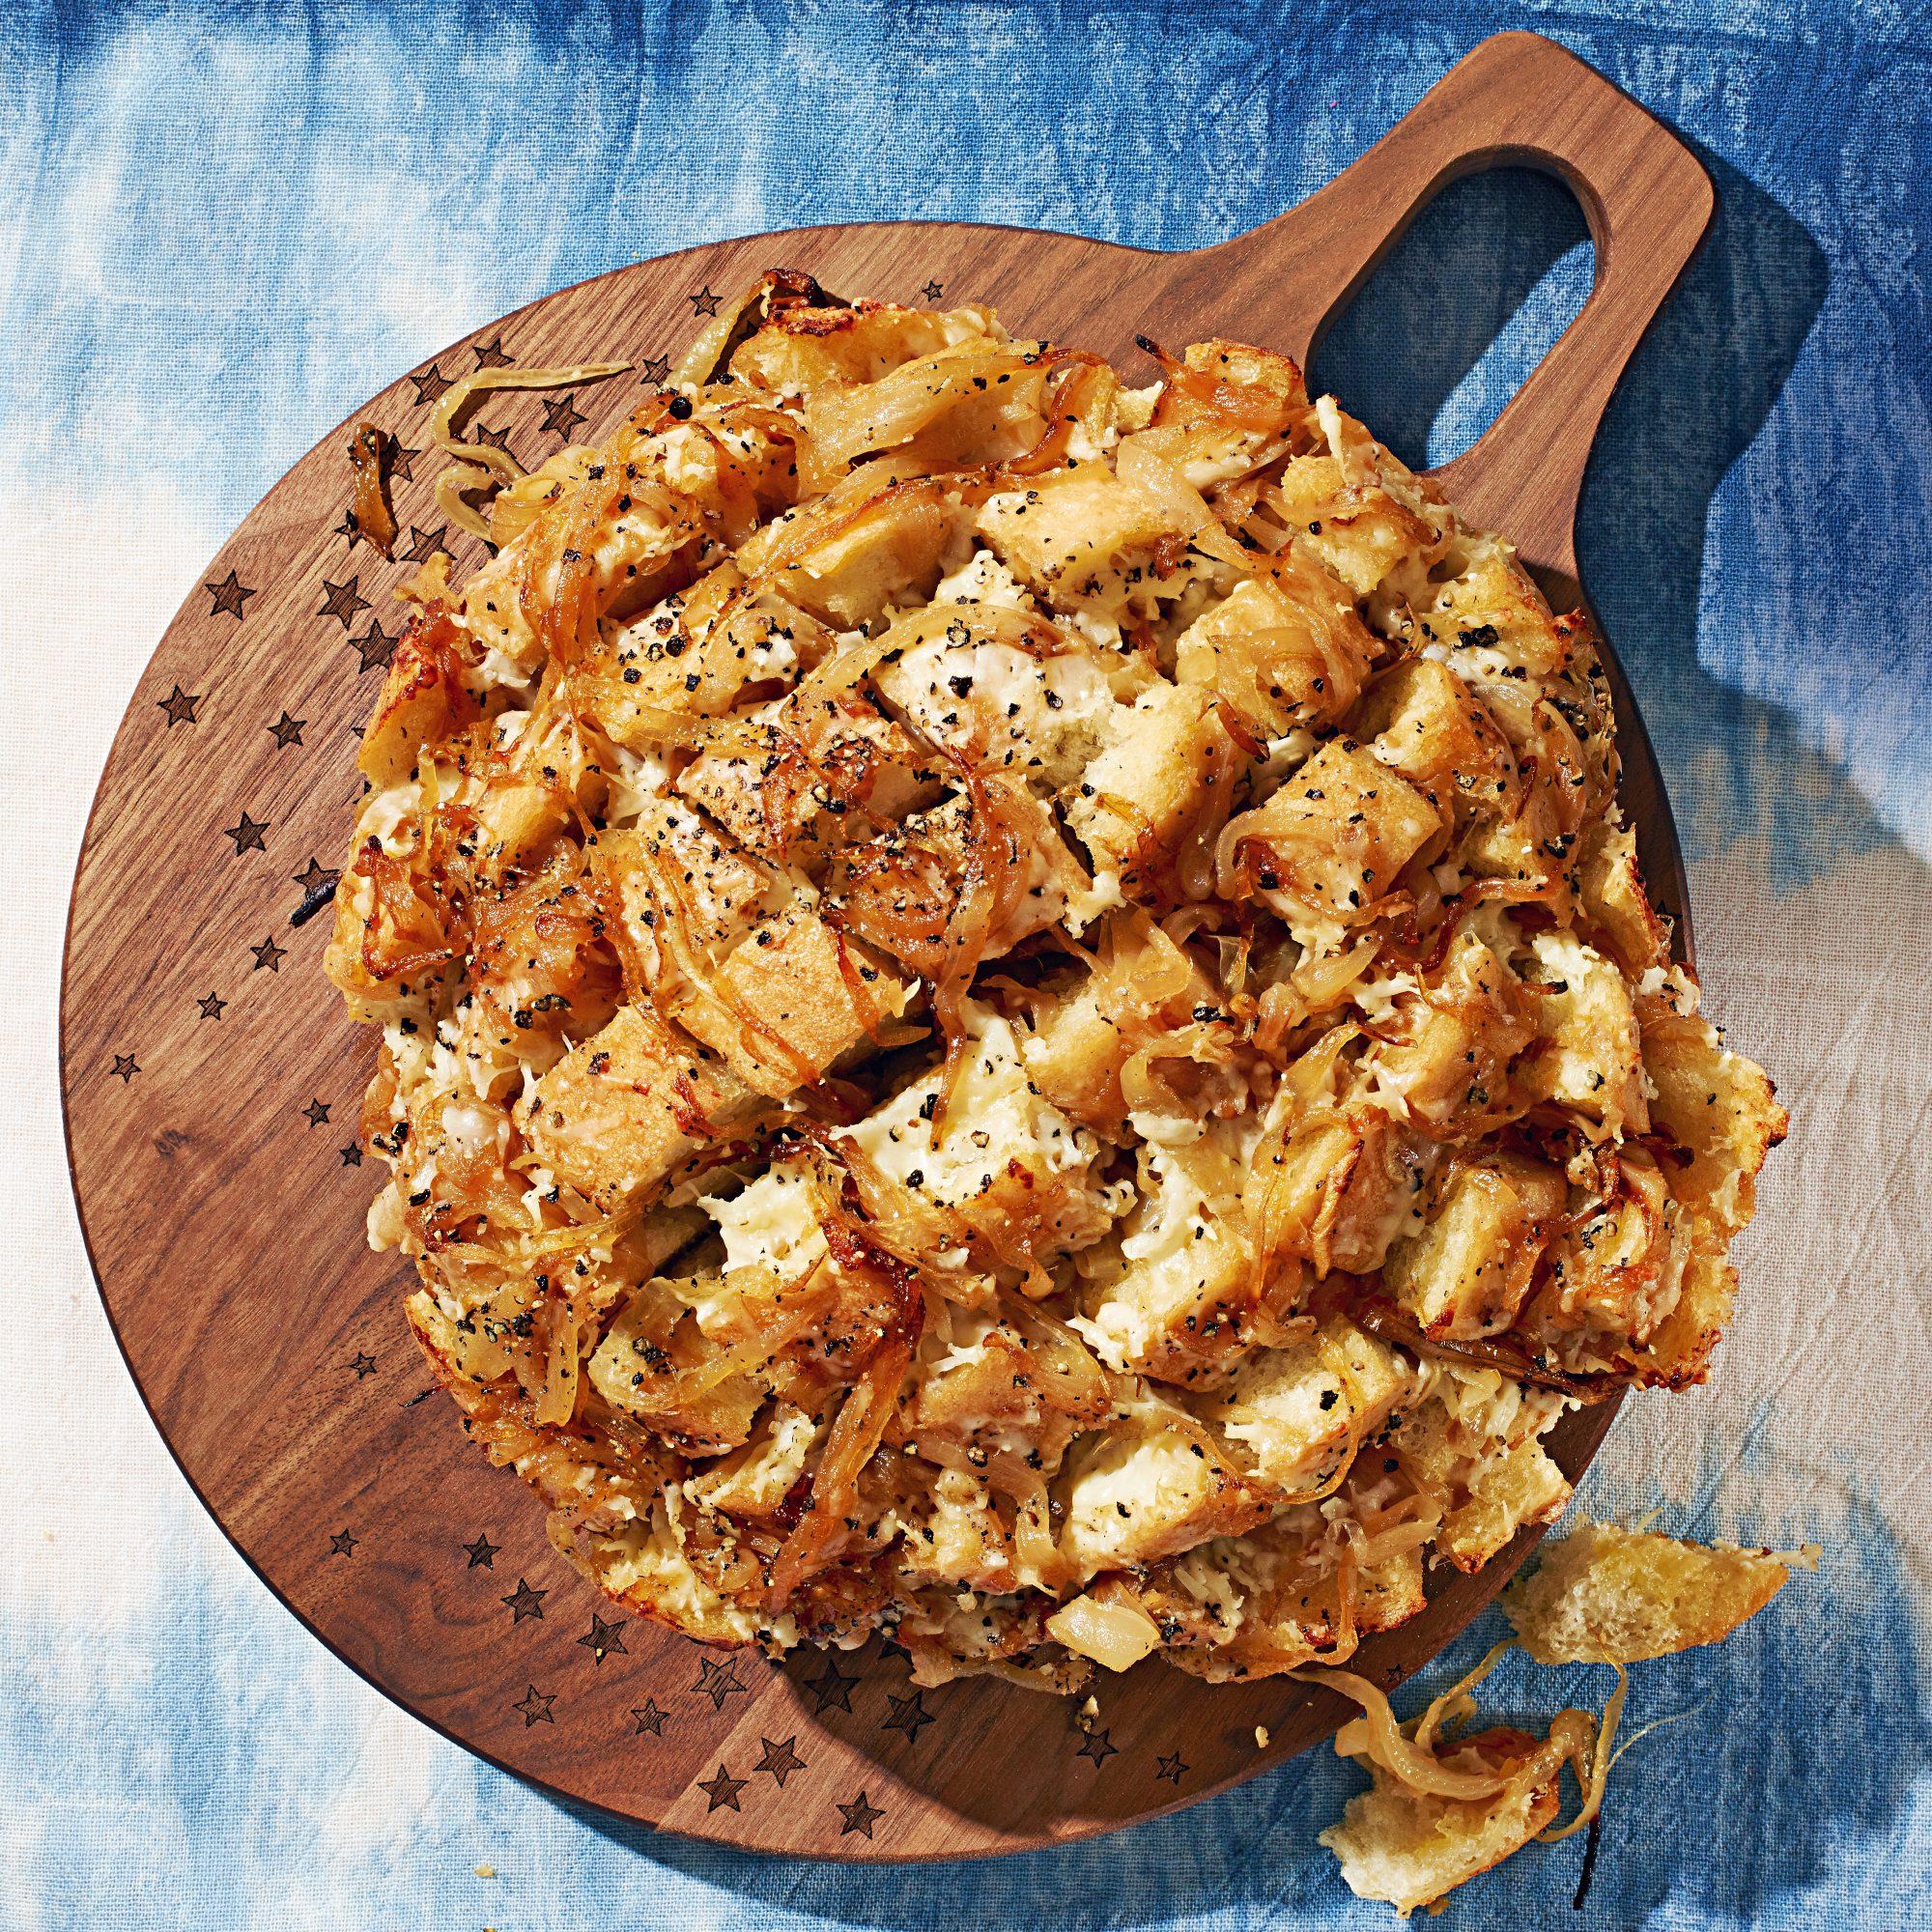 caramelized onion gruyère pull apart bread